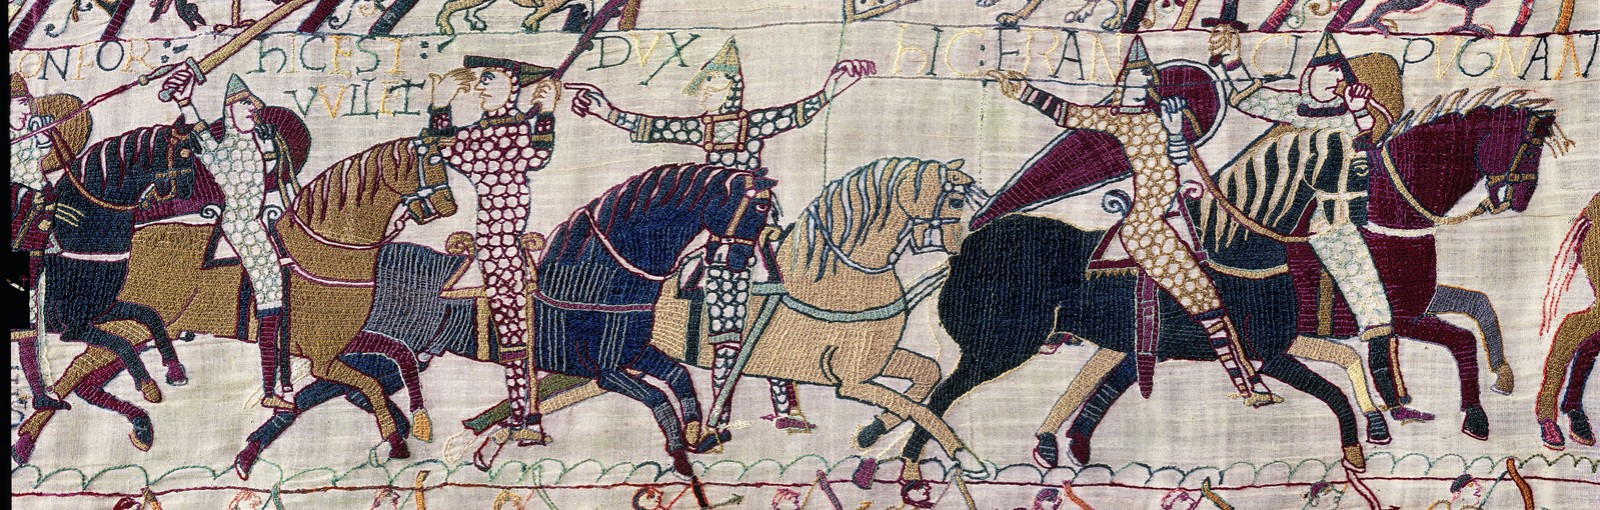 Tapiceria de Bayeux